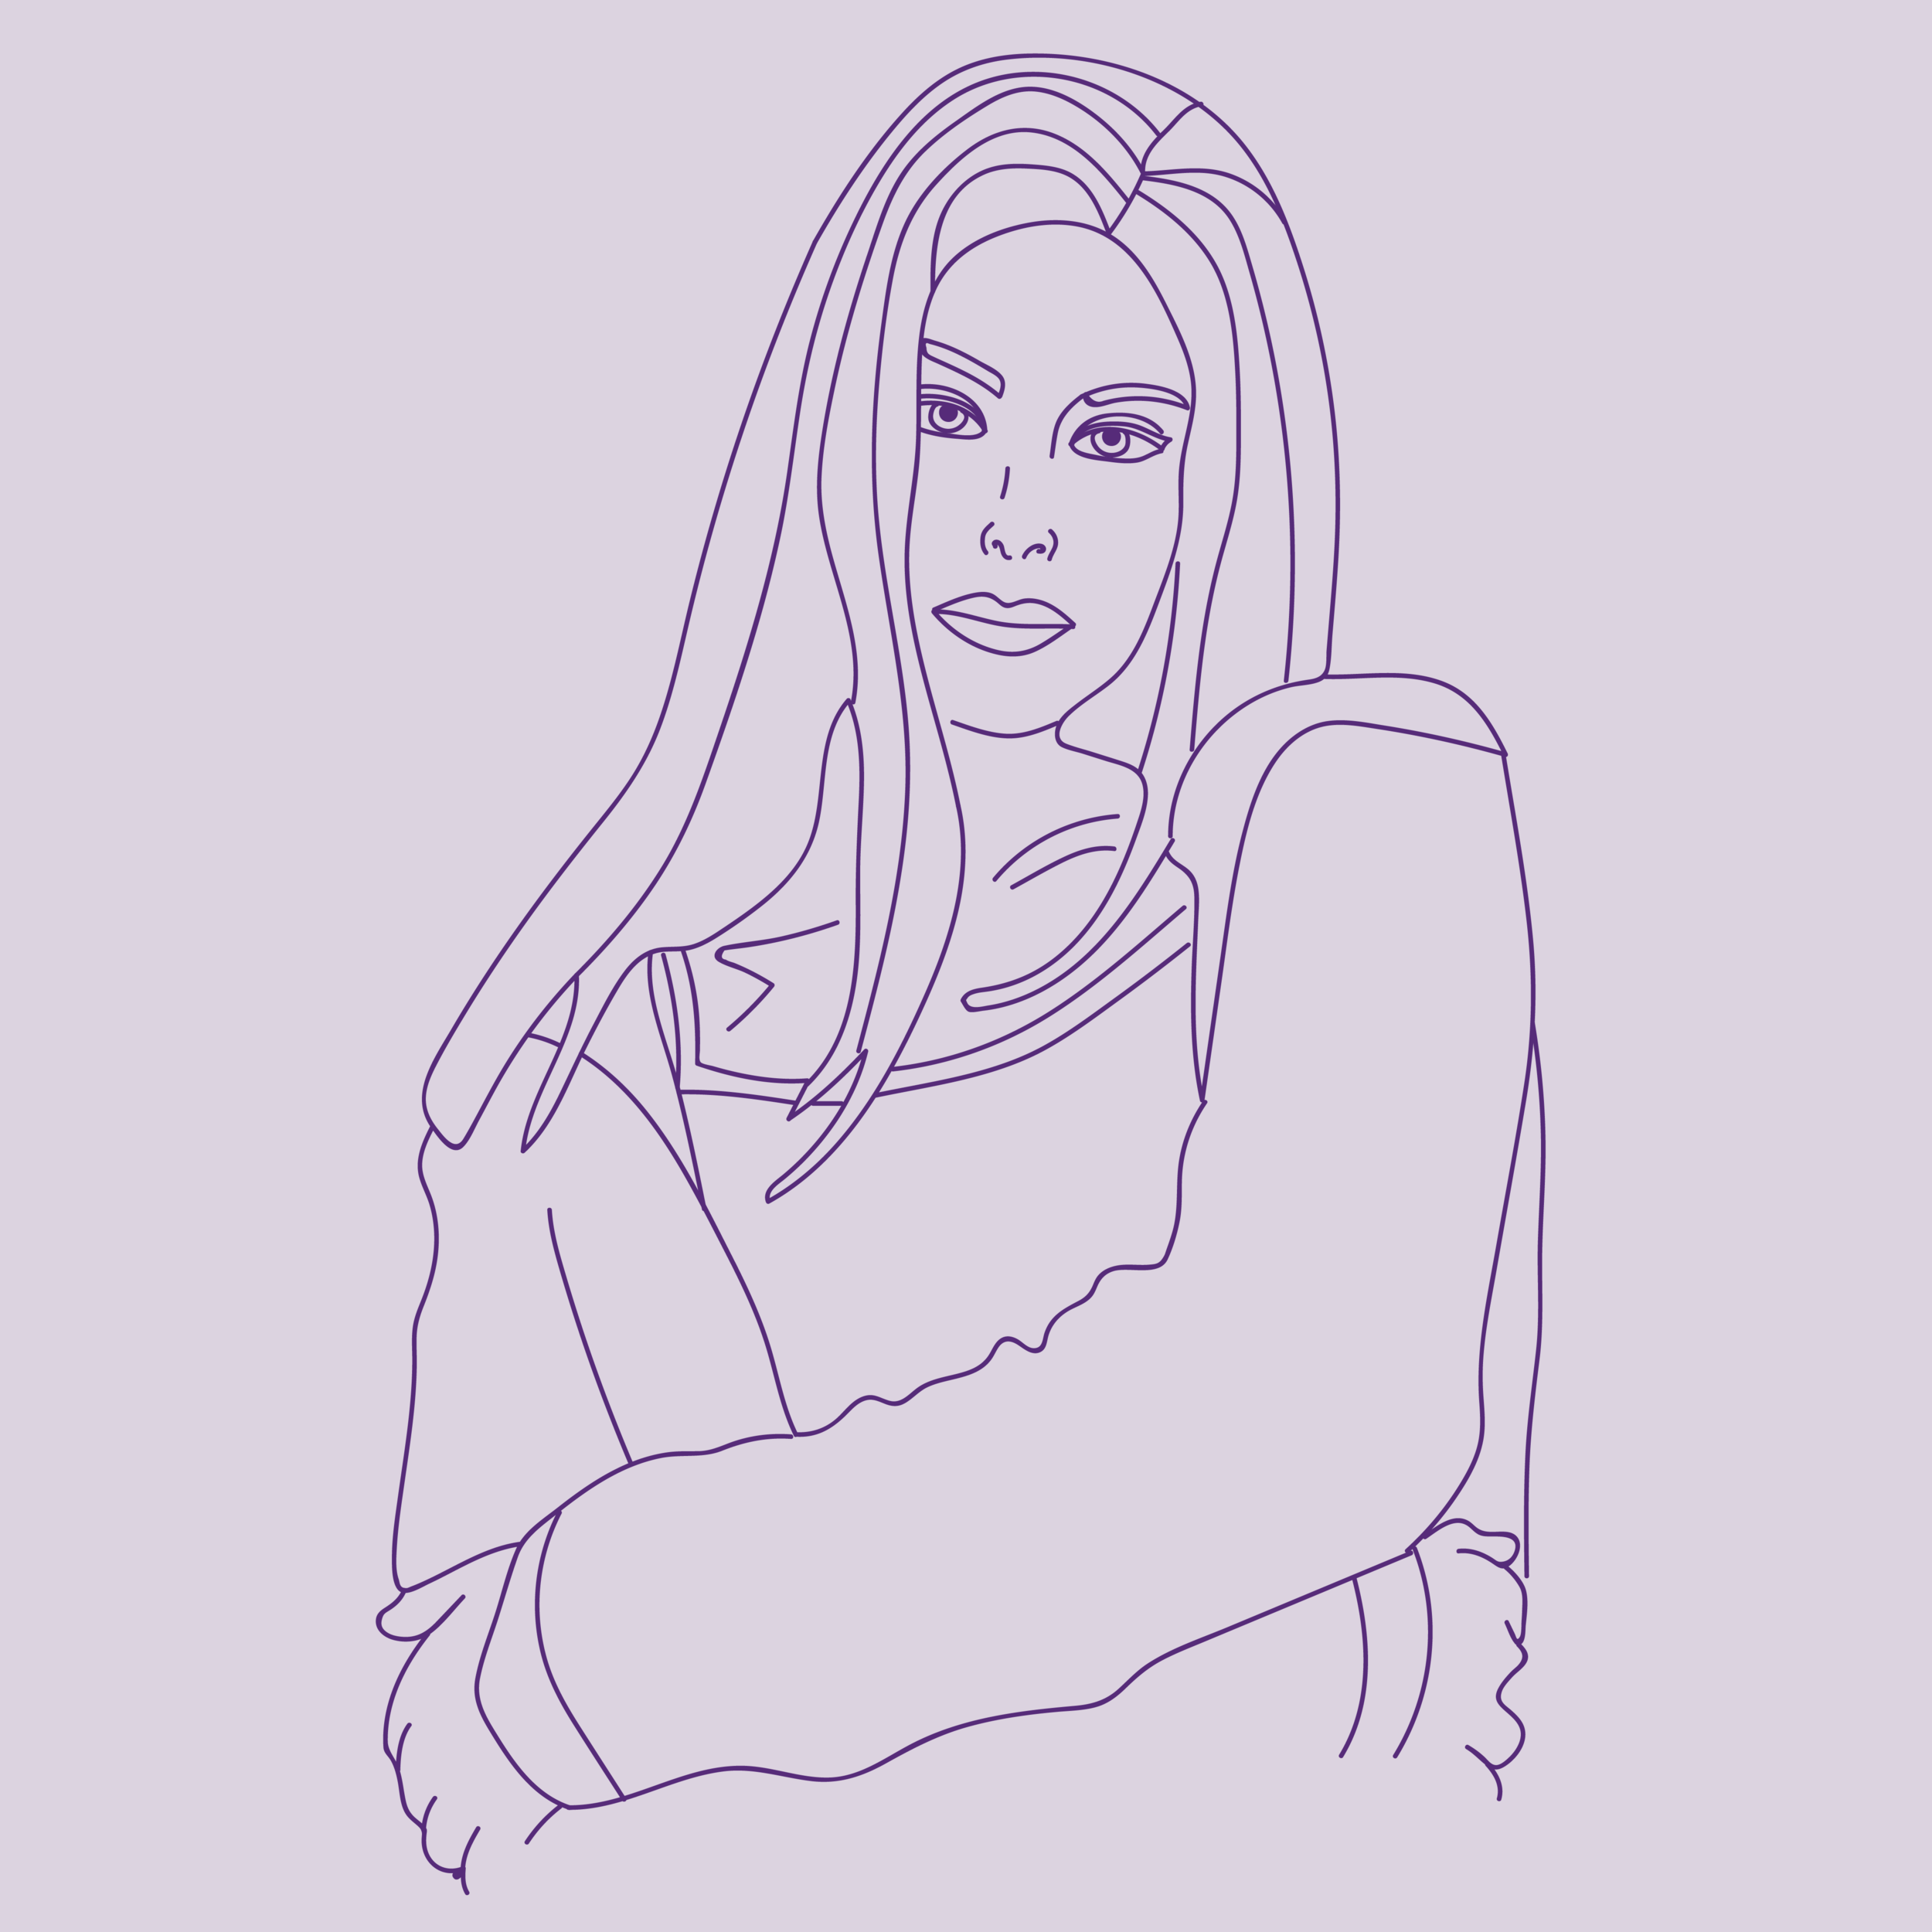 line drawings-07.png